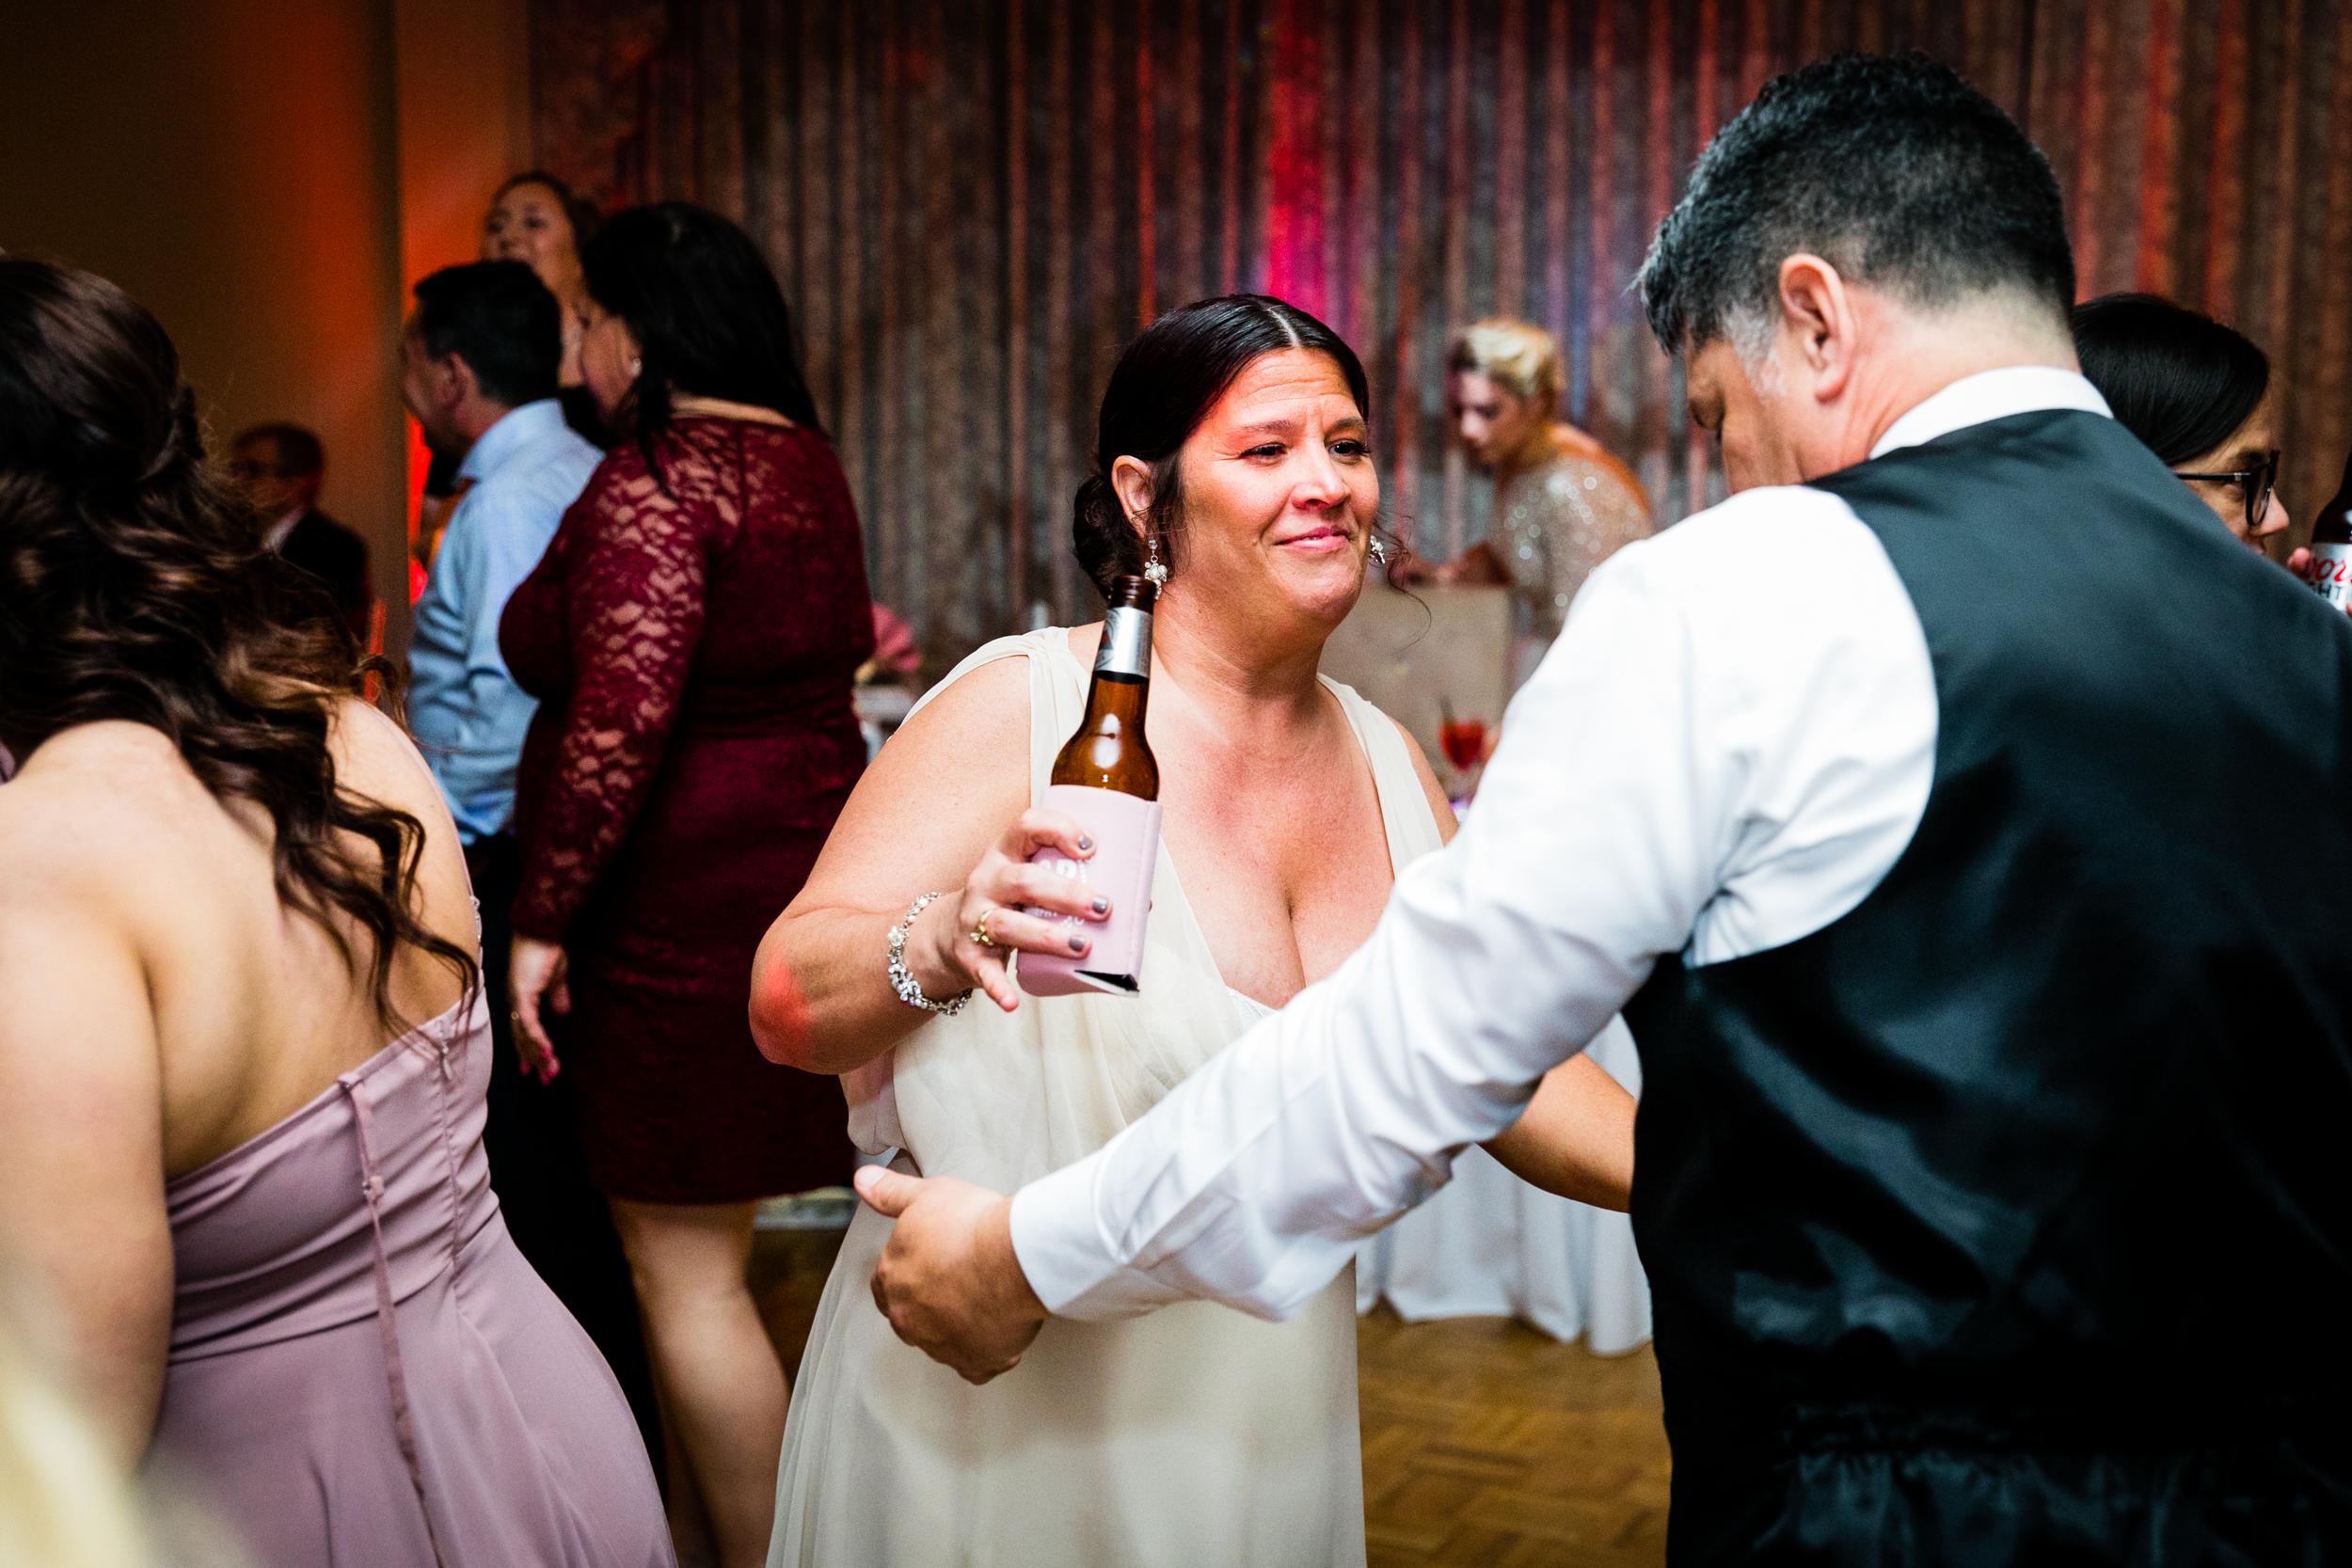 CELEBRATIONS BENSALEM WEDDING PHOTOGRAPHY-99.jpg